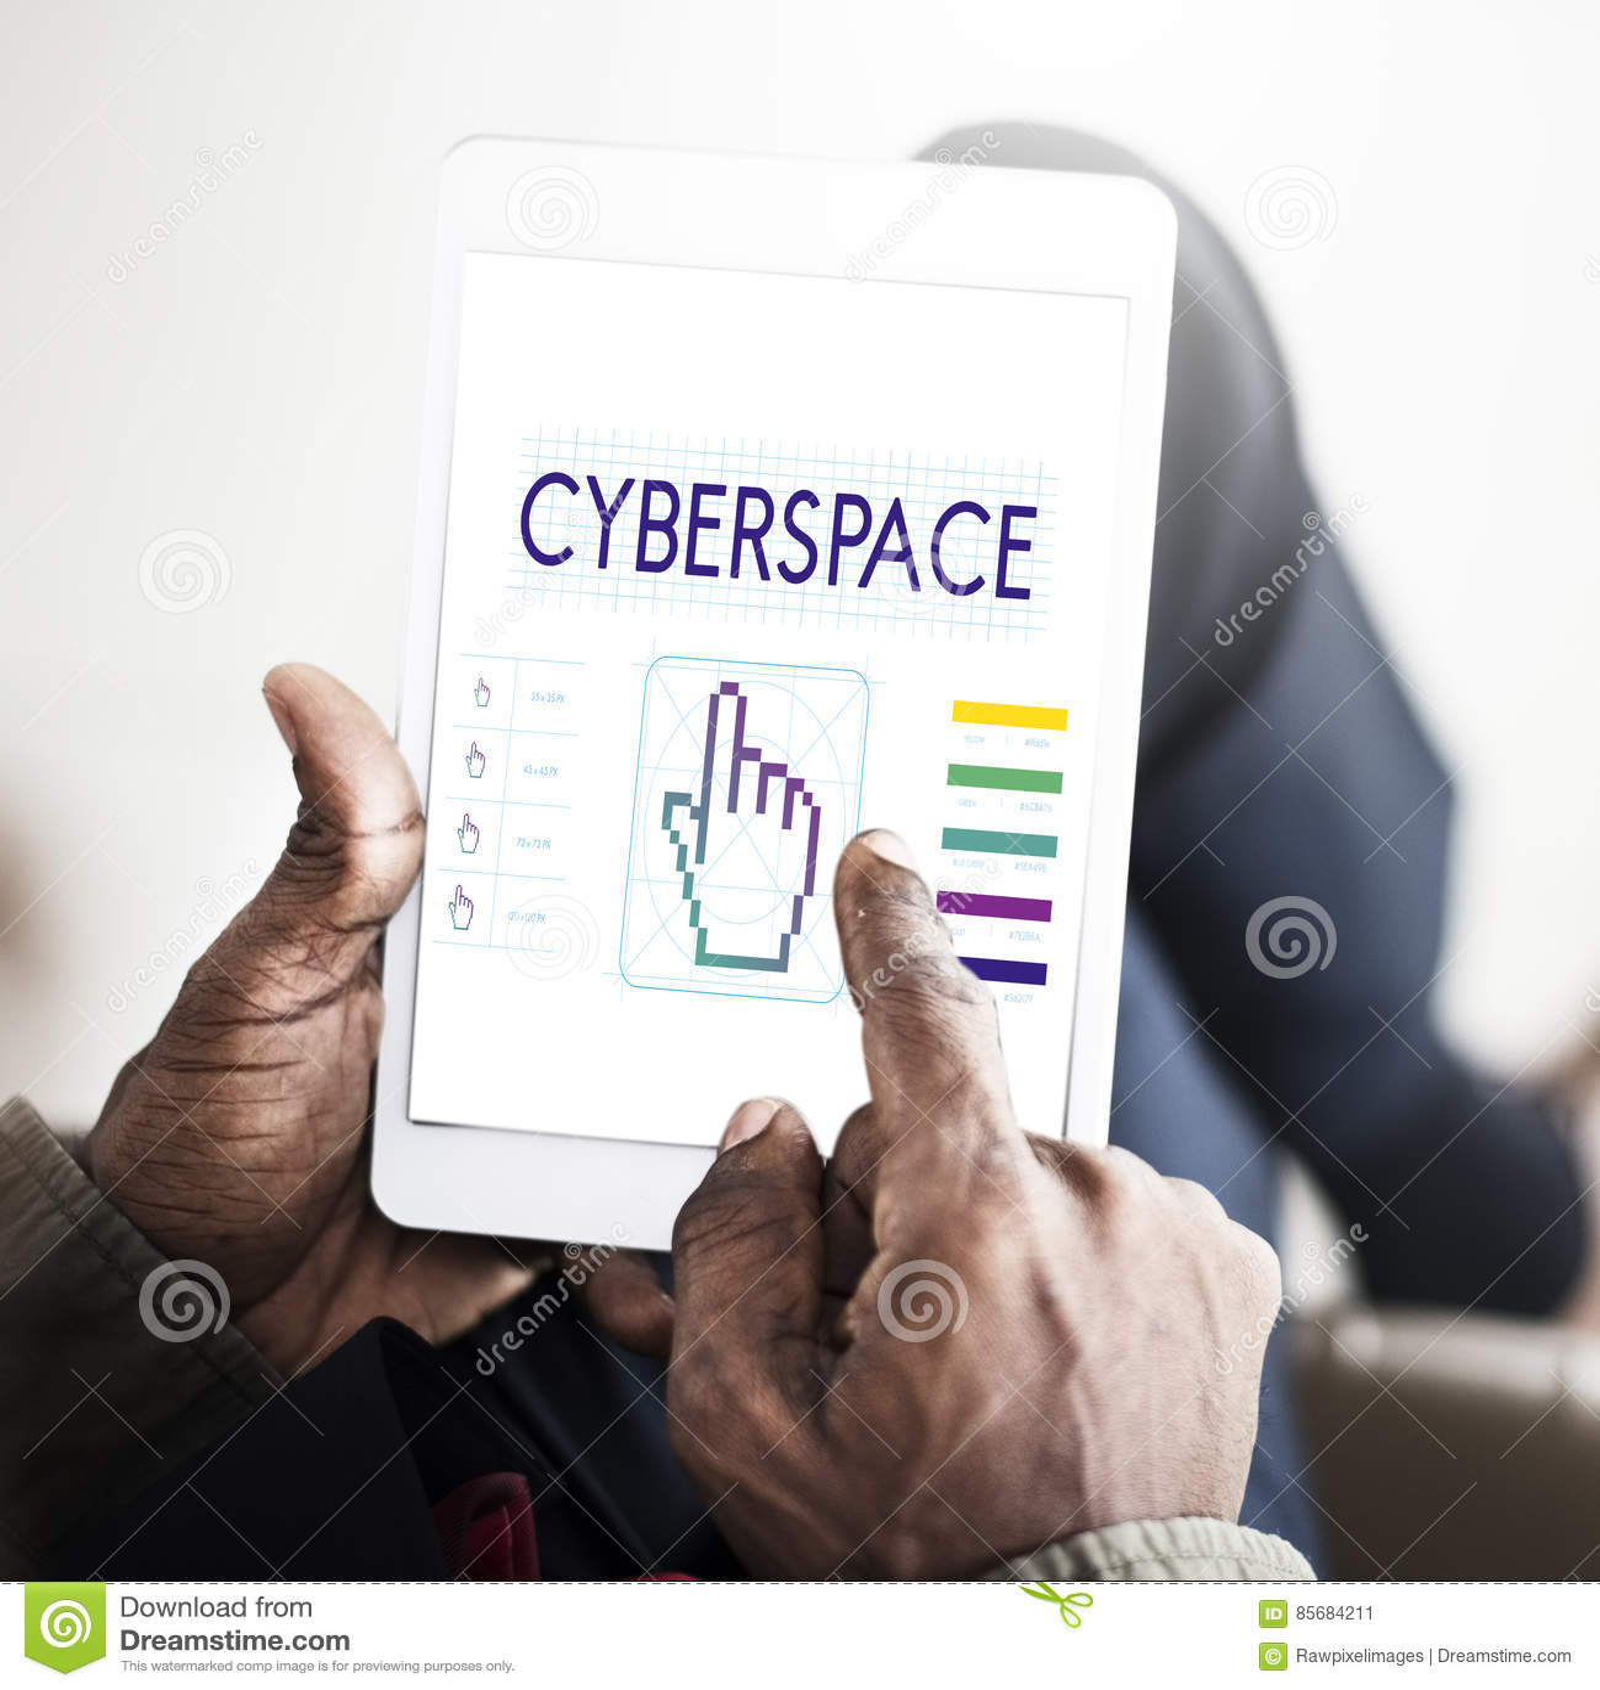 Cyberspace Links Seo Webinar Hand Concept